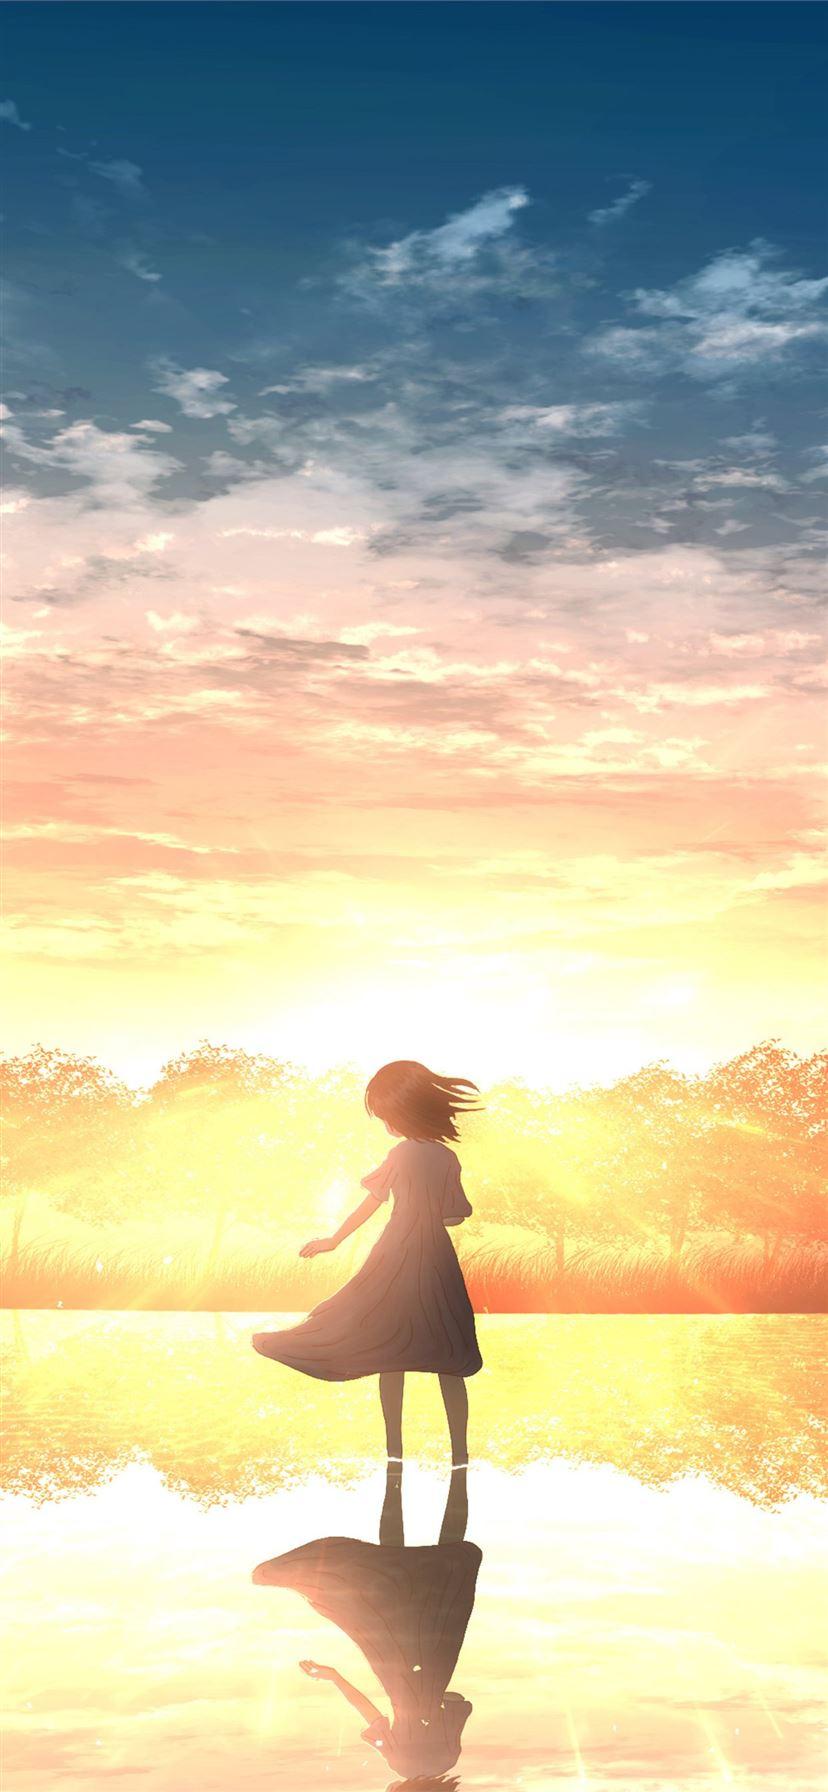 Young Girl Salar De Uyuni Samsung Galaxy Note 9 8 Iphone 11 Wallpapers Free Download